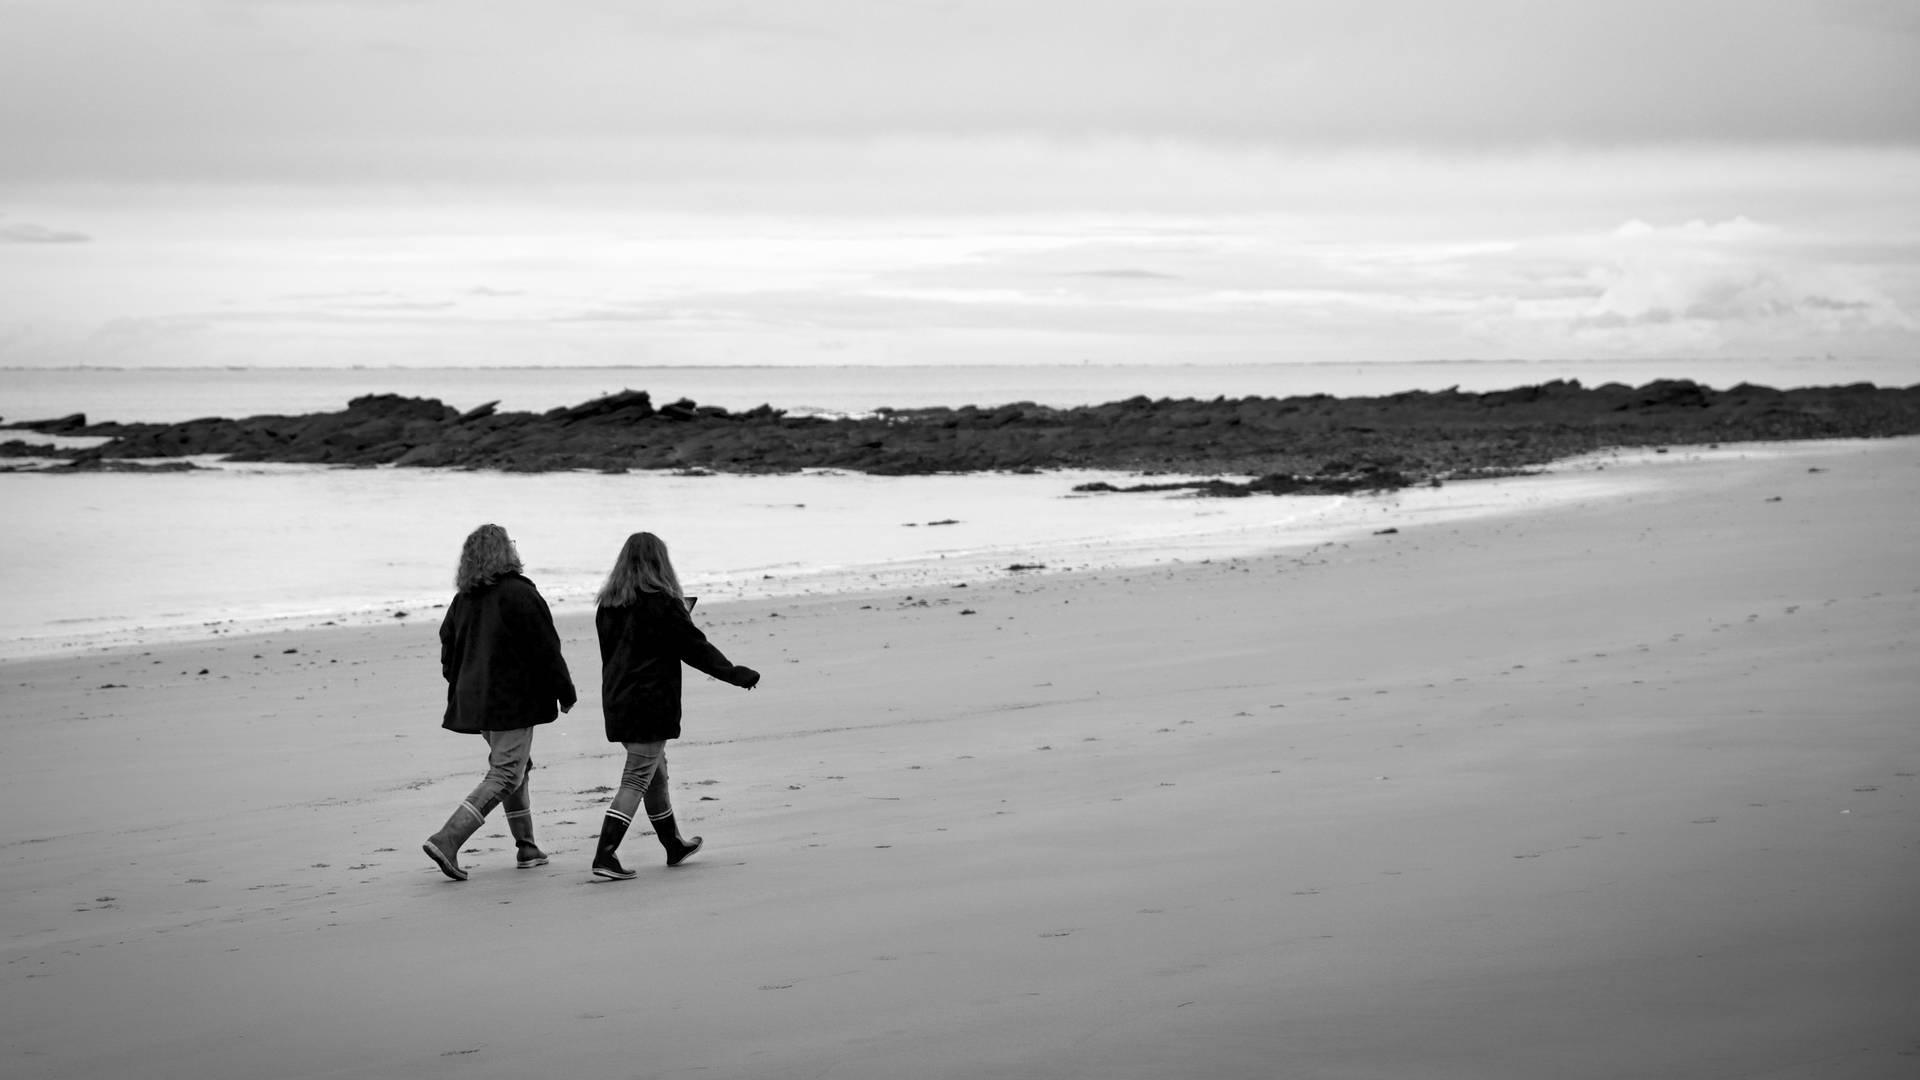 Balade, L'île d'Yeu © Aurélien Curtet